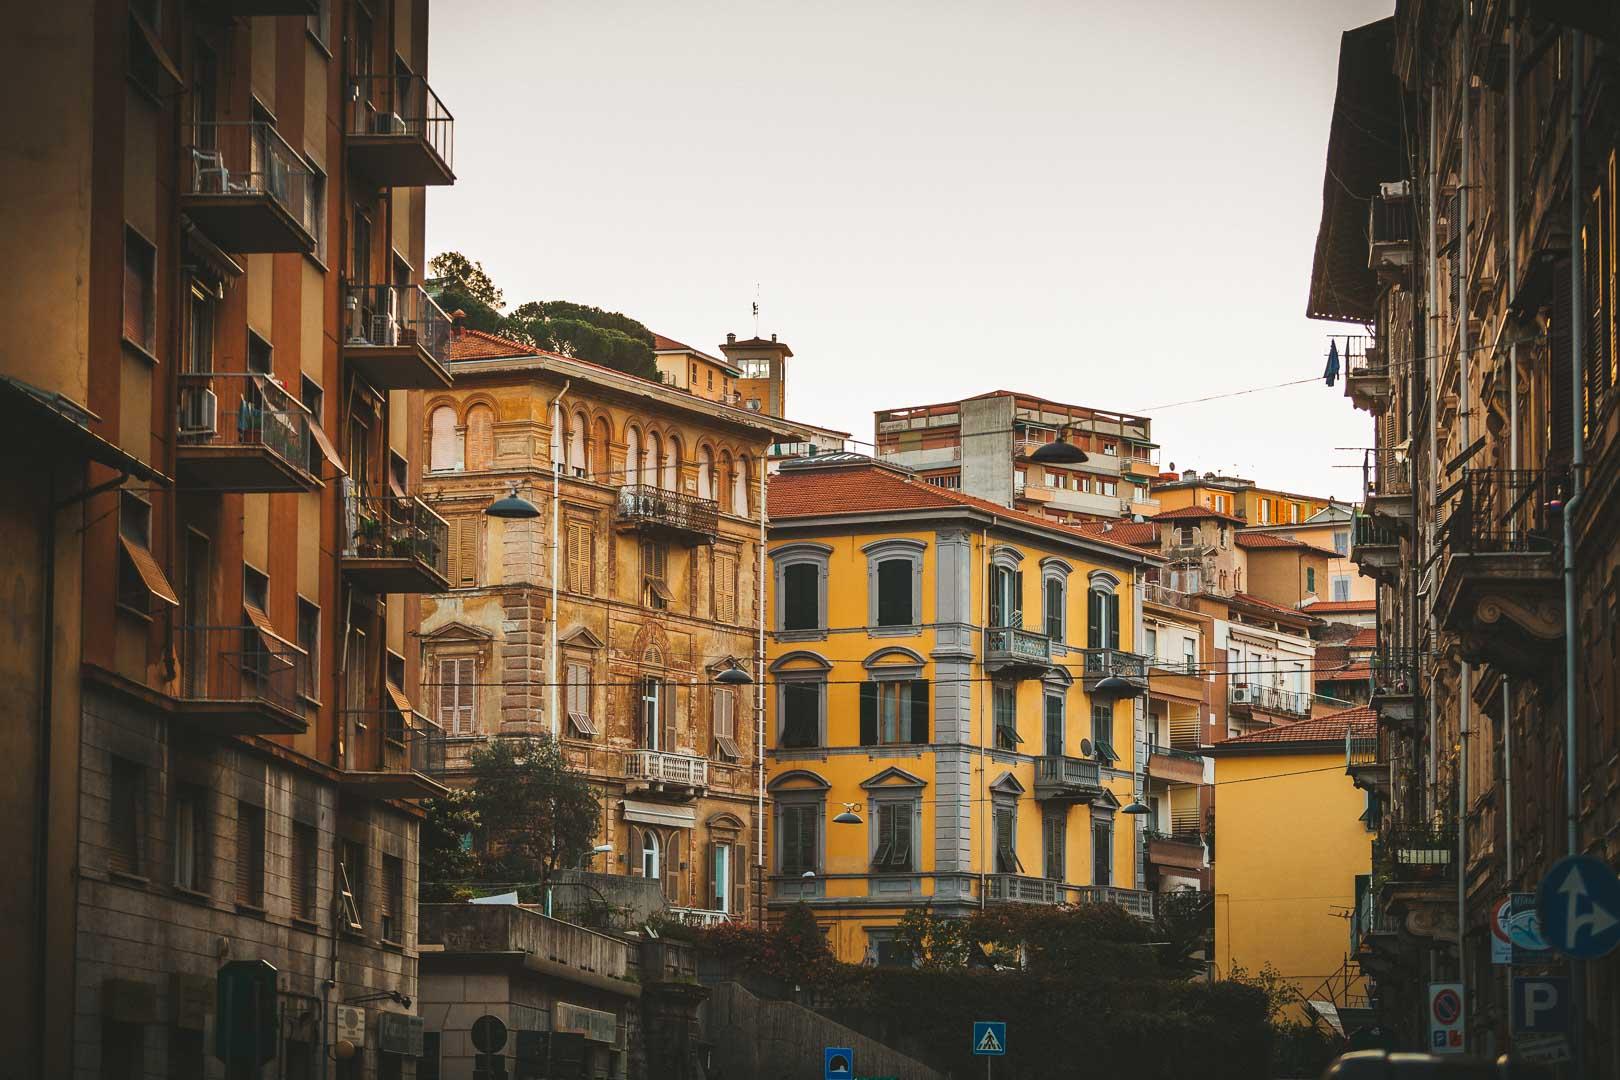 La Spezia Italy  1 Hour to Explore the City  kevmrccom